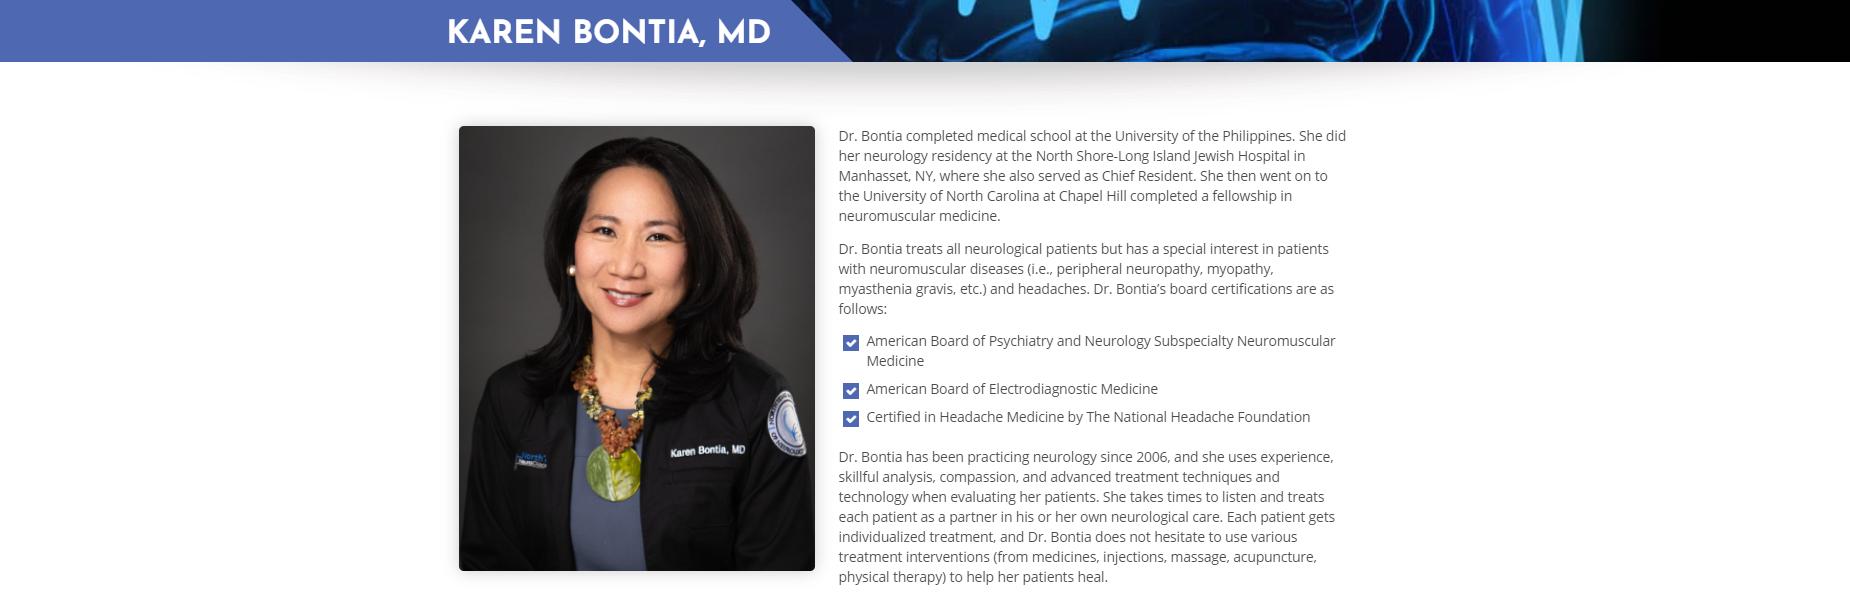 Karen Bontia, MD